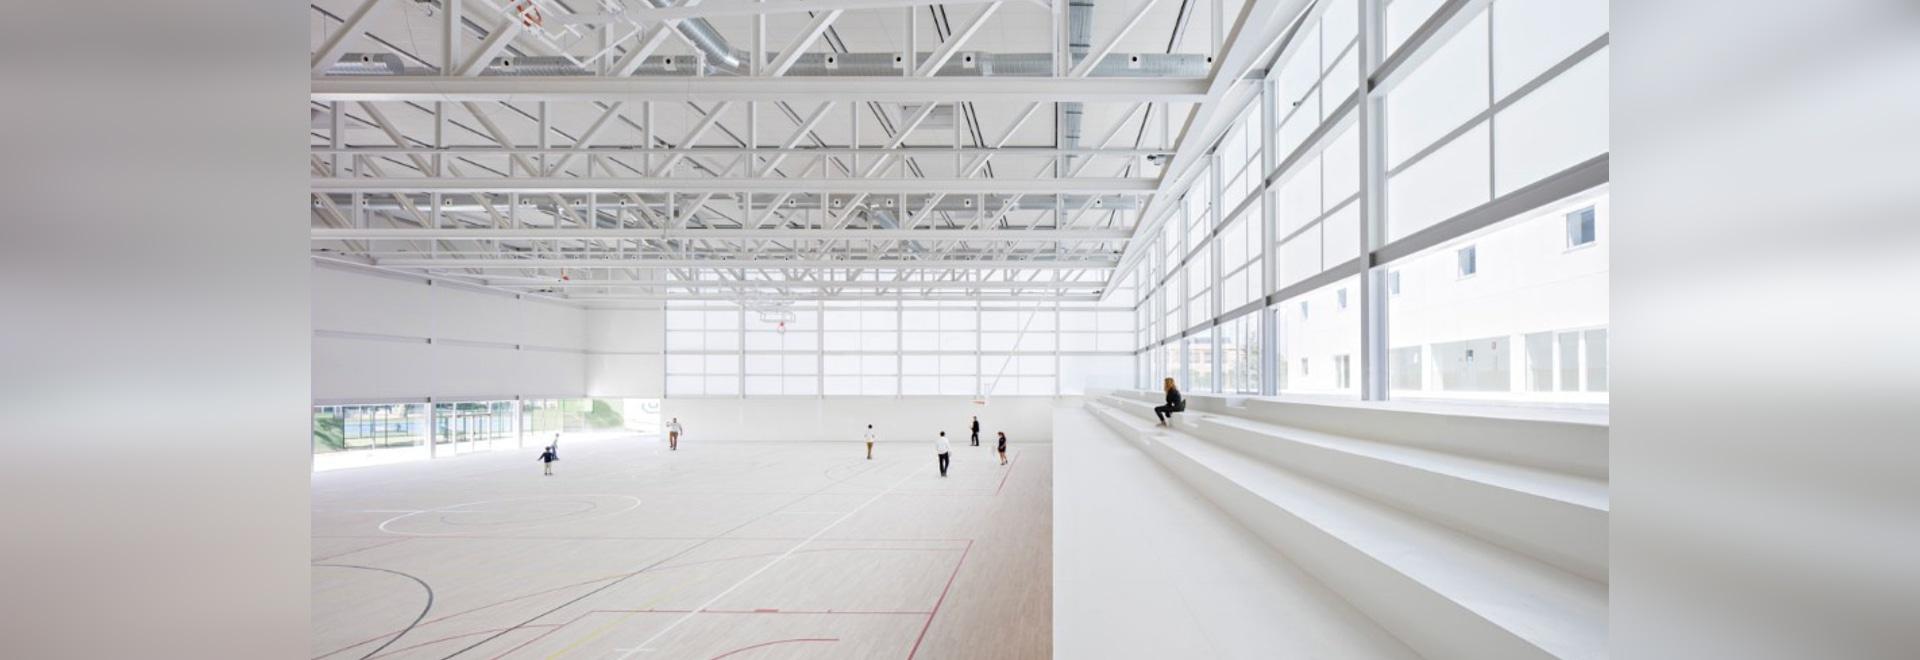 Multi-sport pavilion